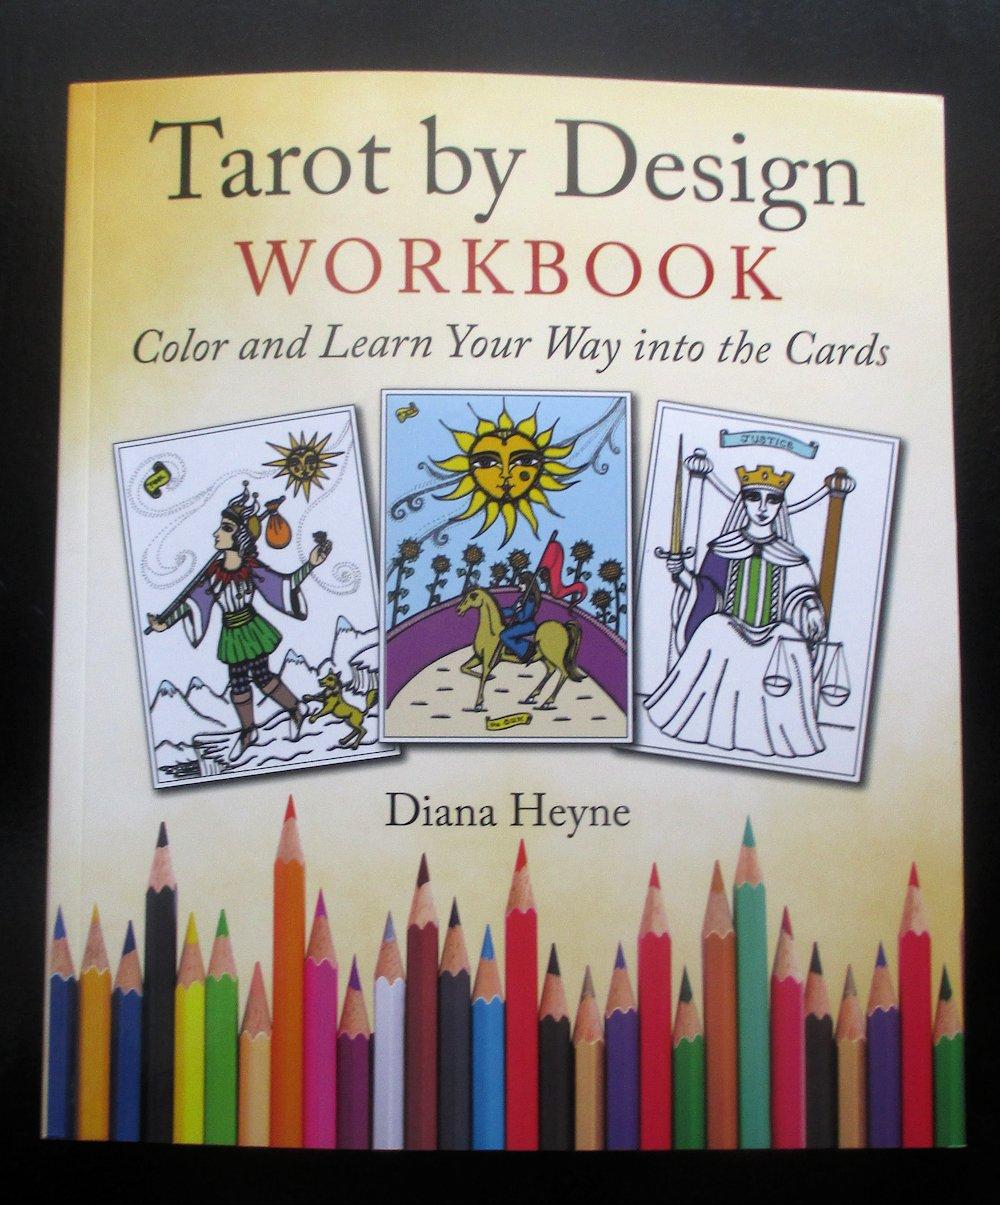 REVIEW Tarot By Design Workbook Diana Heyne